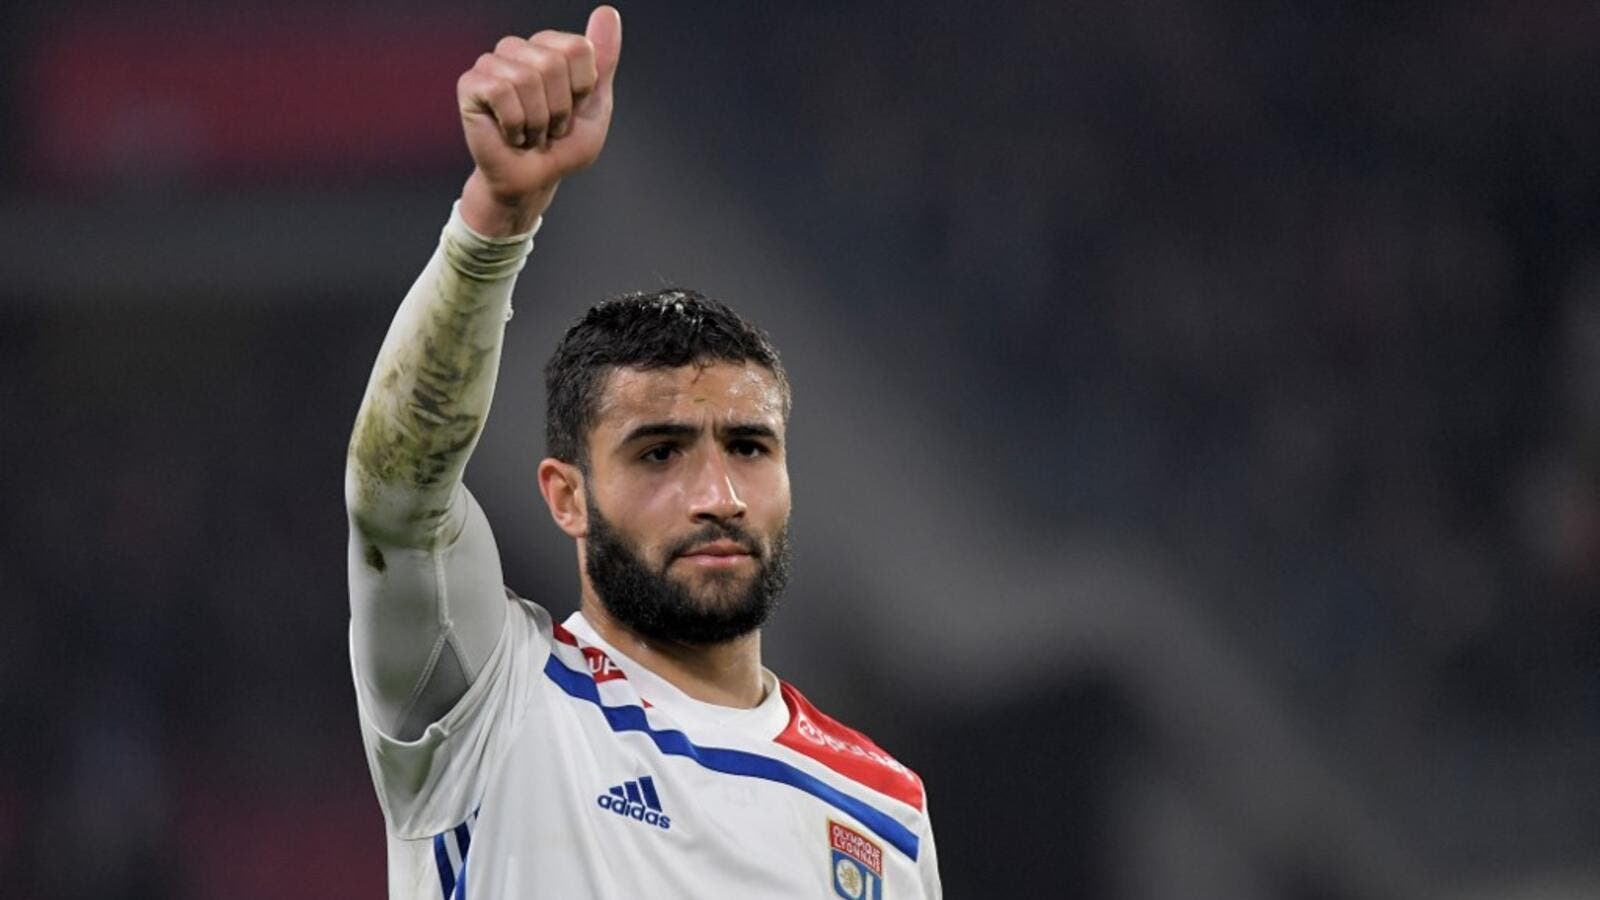 Lyon president Aulas admits Liverpool target Fekir can leave